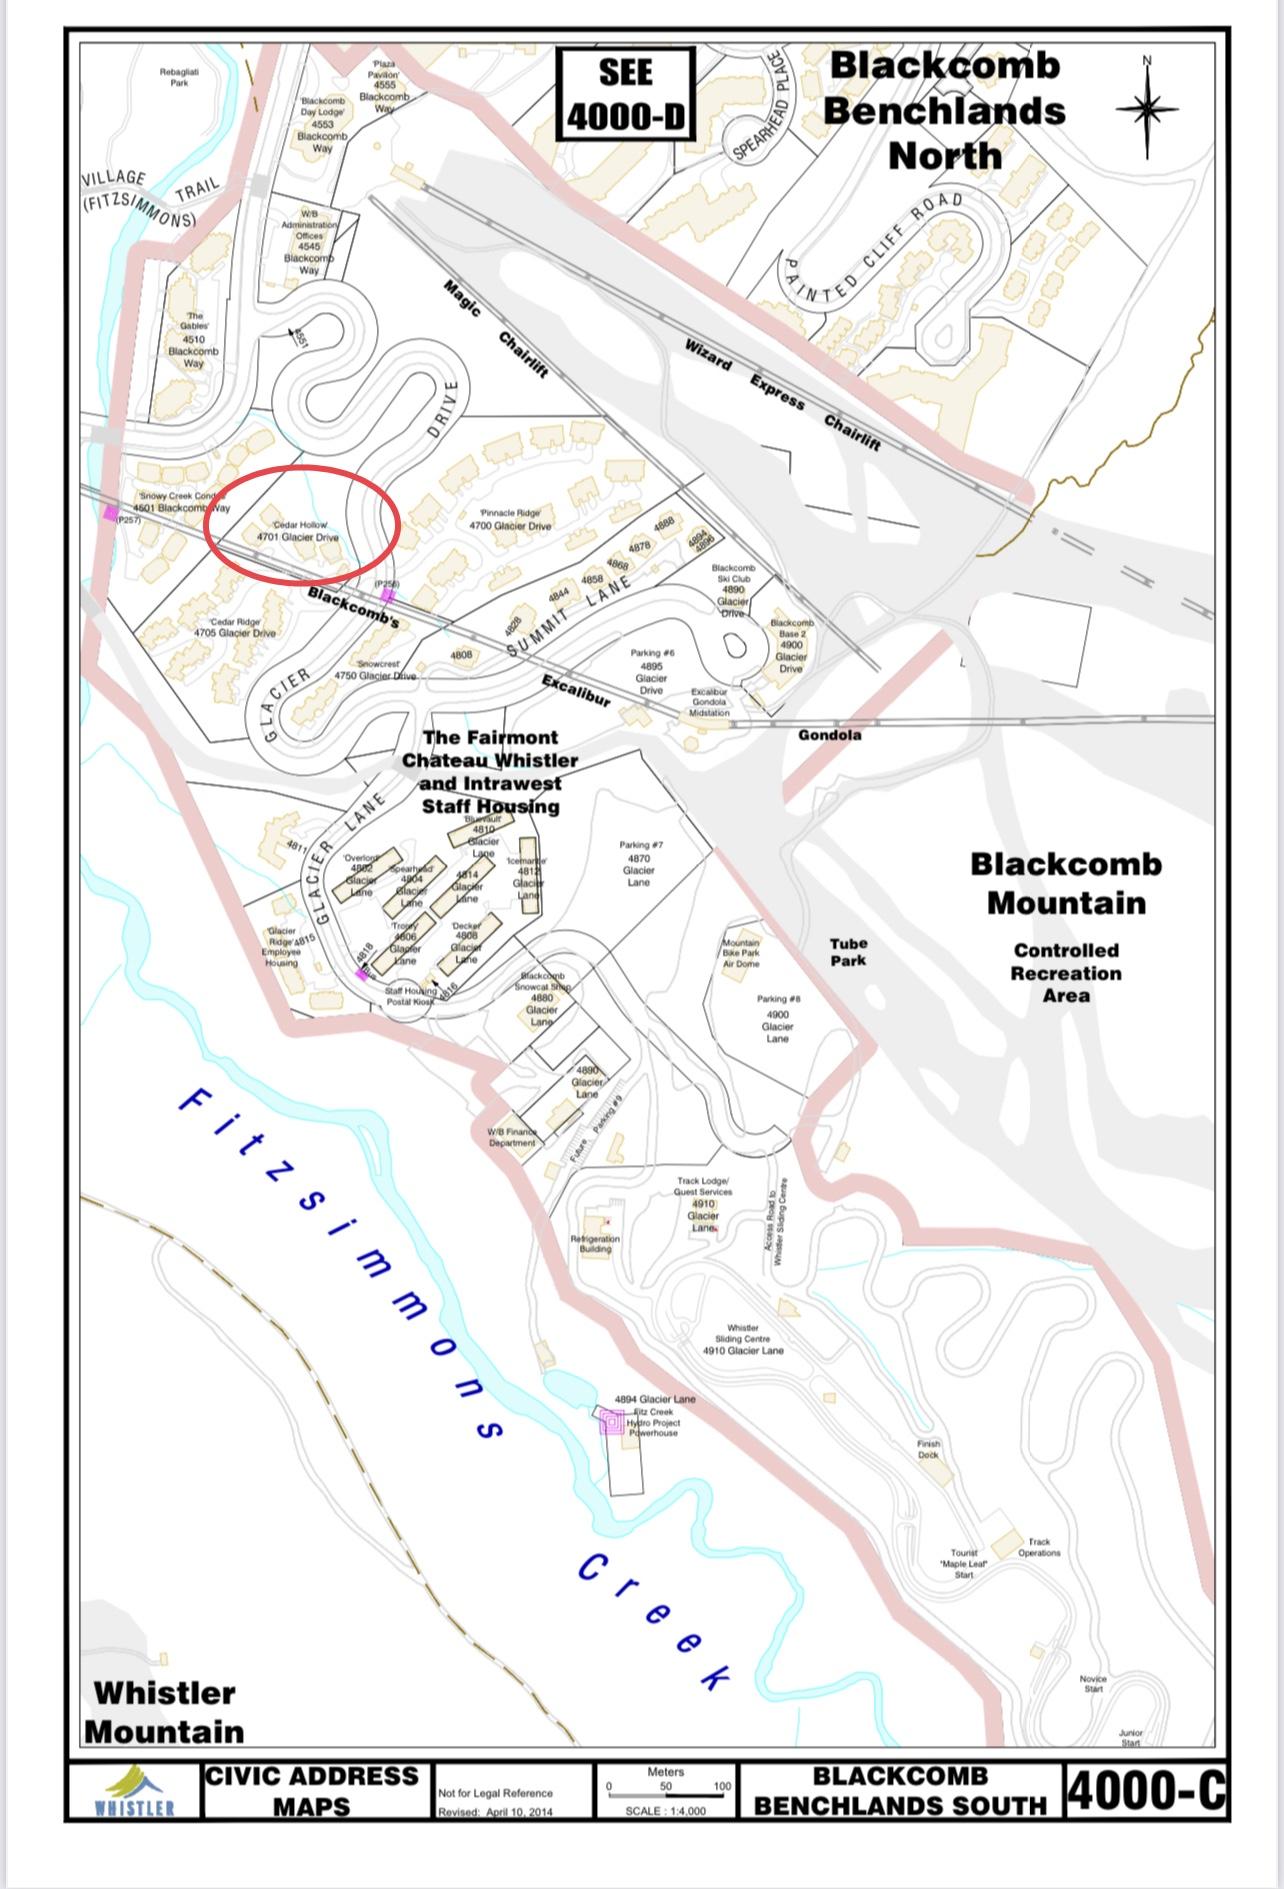 Cedar Hollow Civic address map showing location on blackcomb mountain